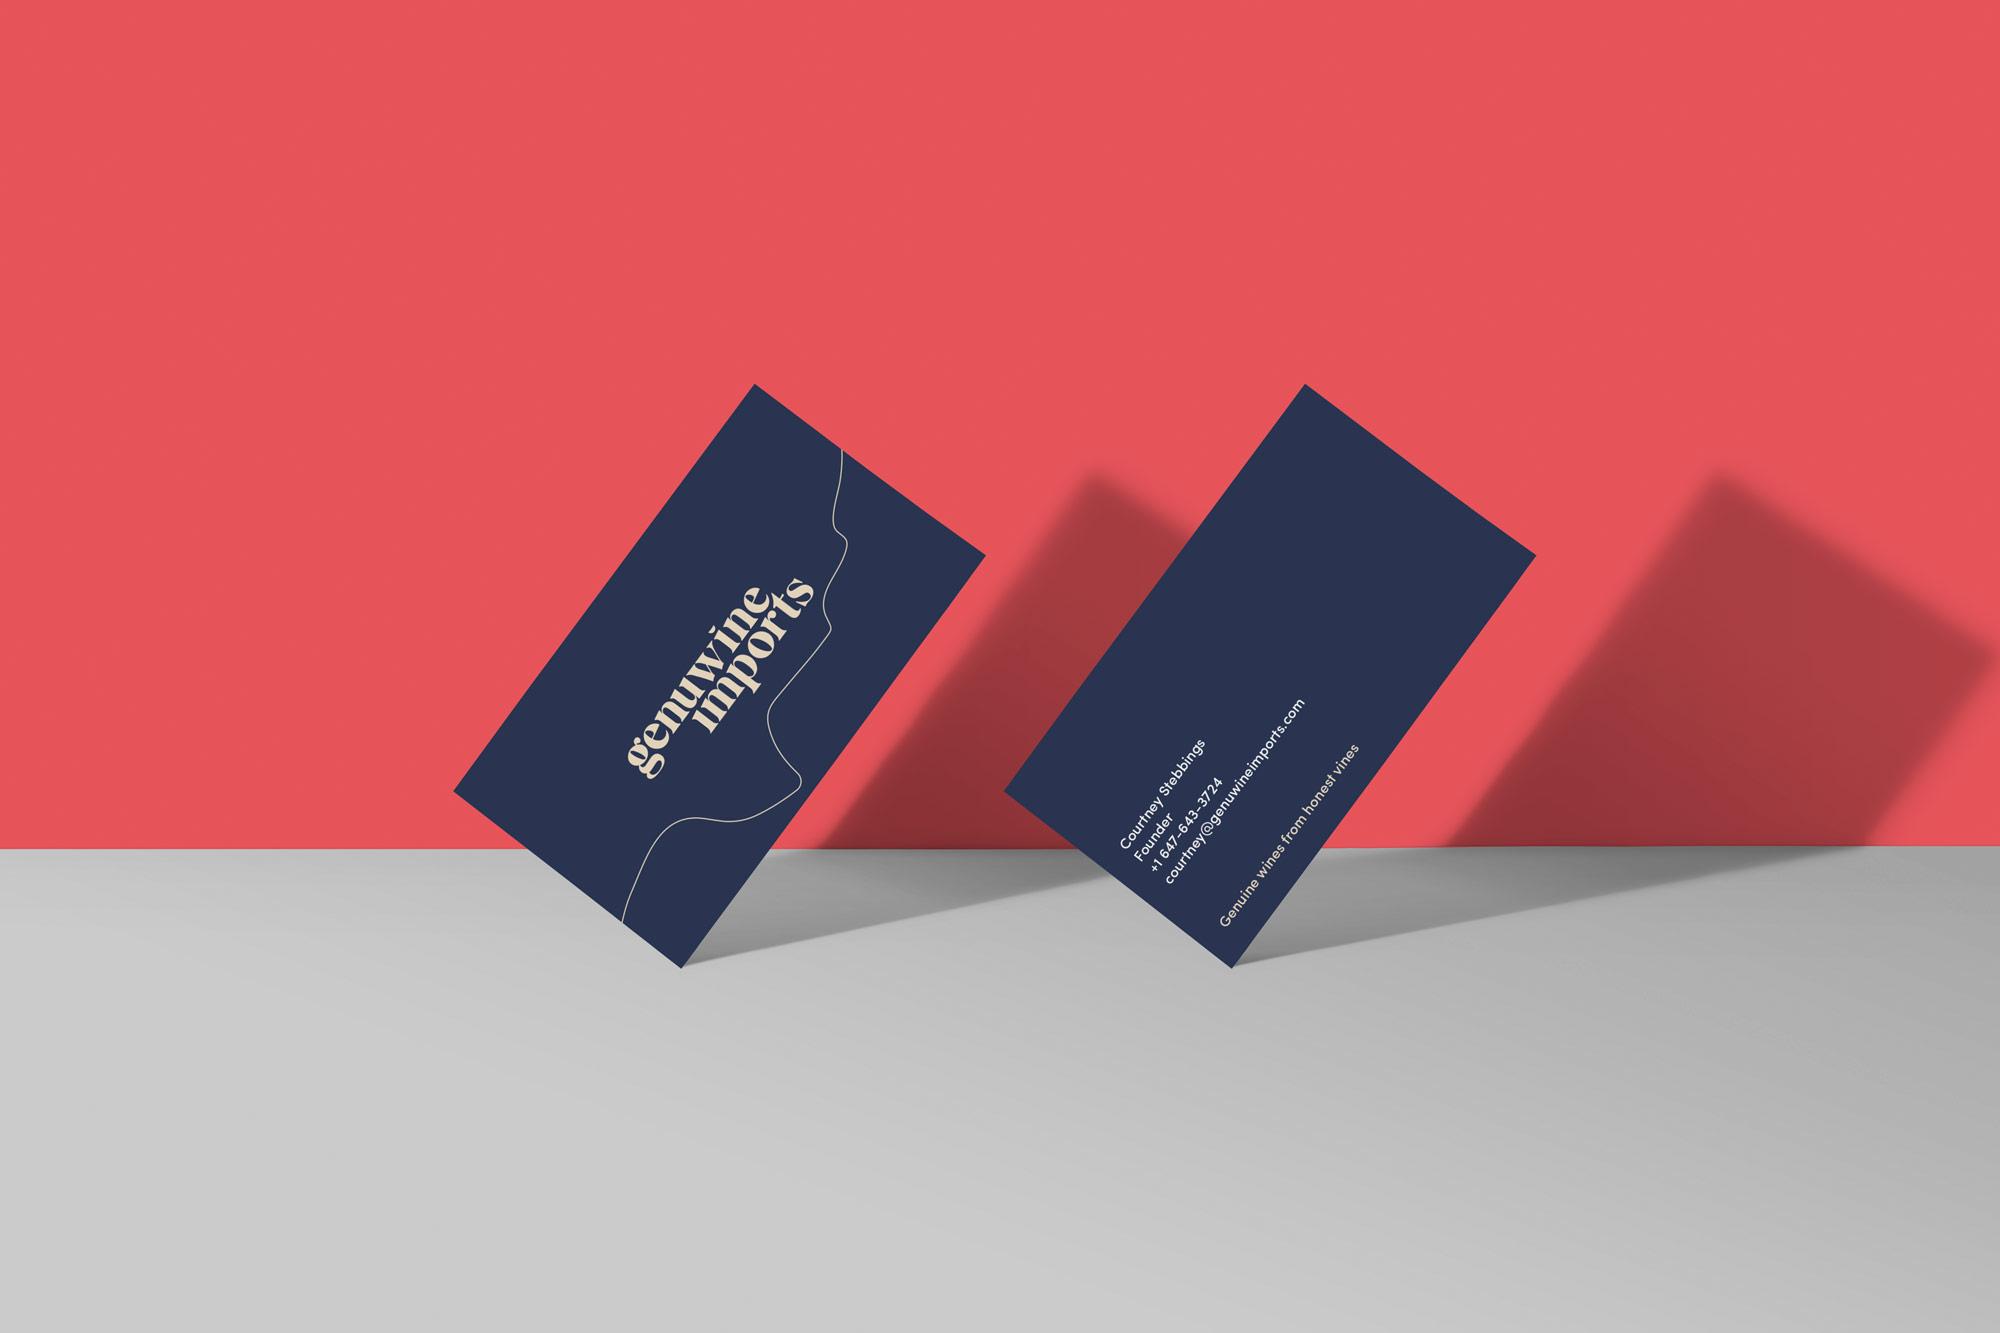 gpj-studio-genuwine-brand-identity-cs-08